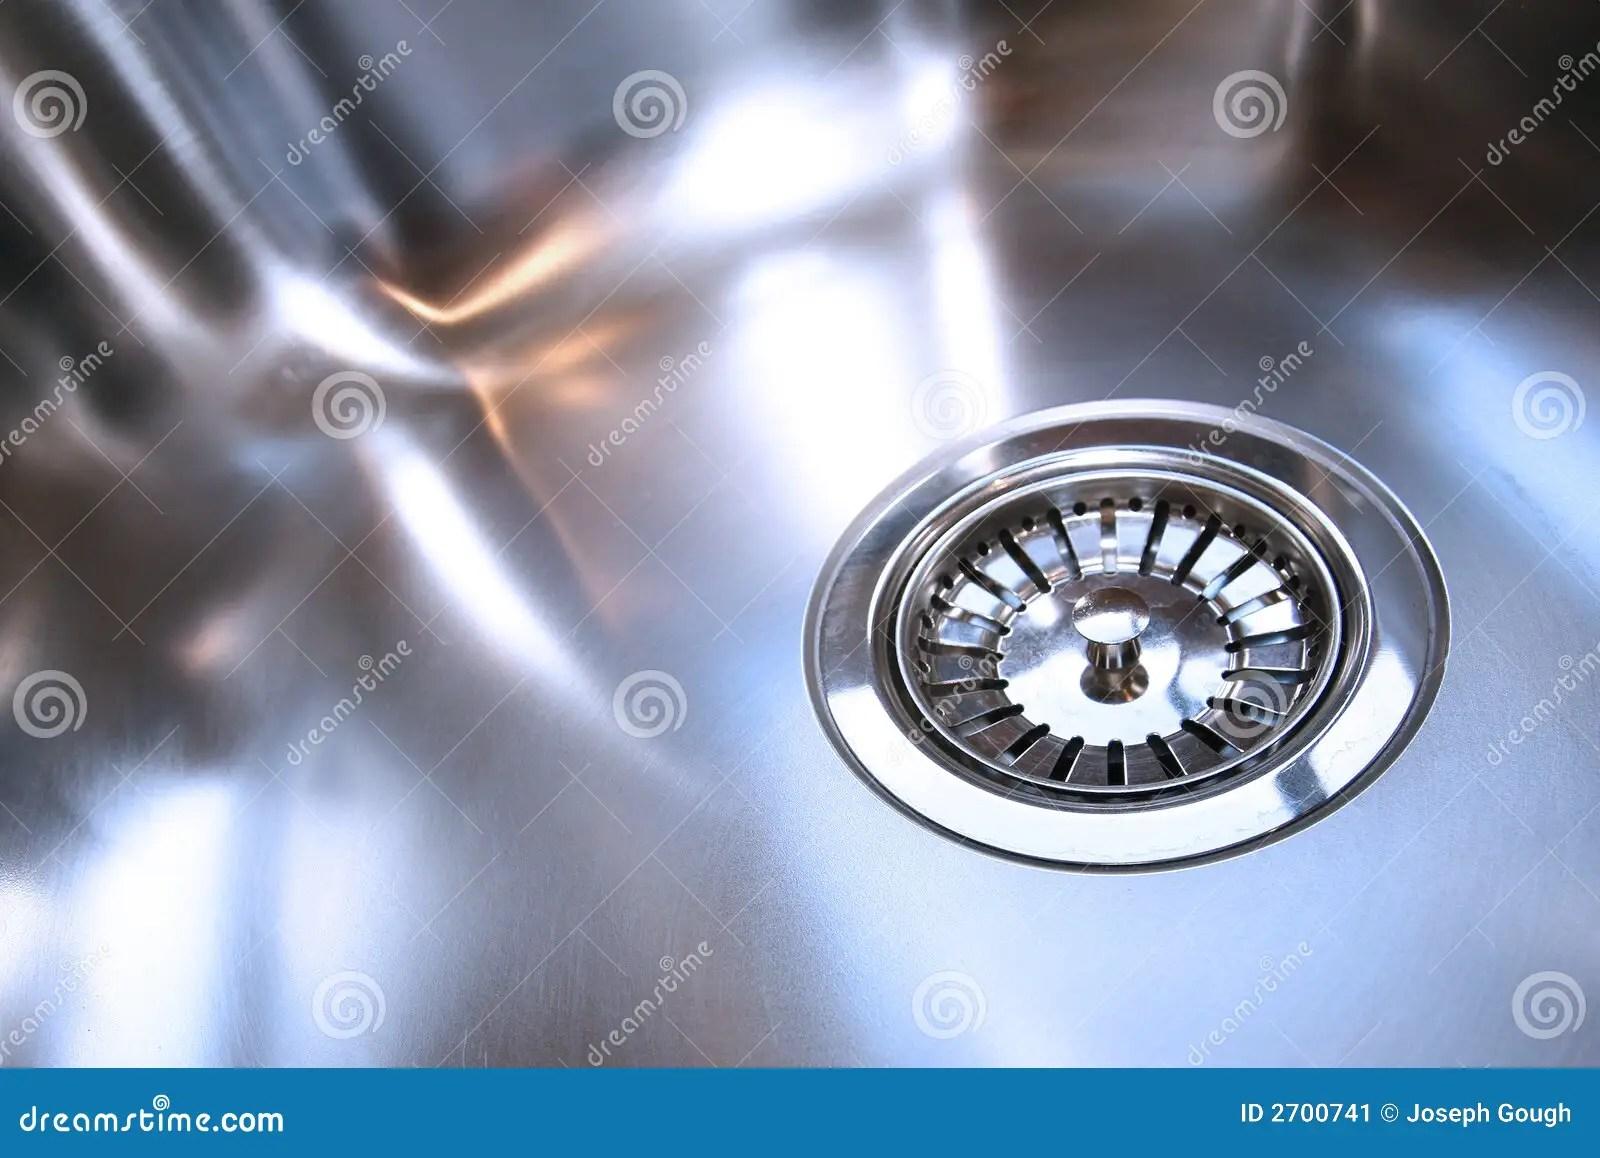 slow draining bathroom sink kitchen sink draining slowly unclog kitchen sink drain bathroom sink plumbing besides bathroom